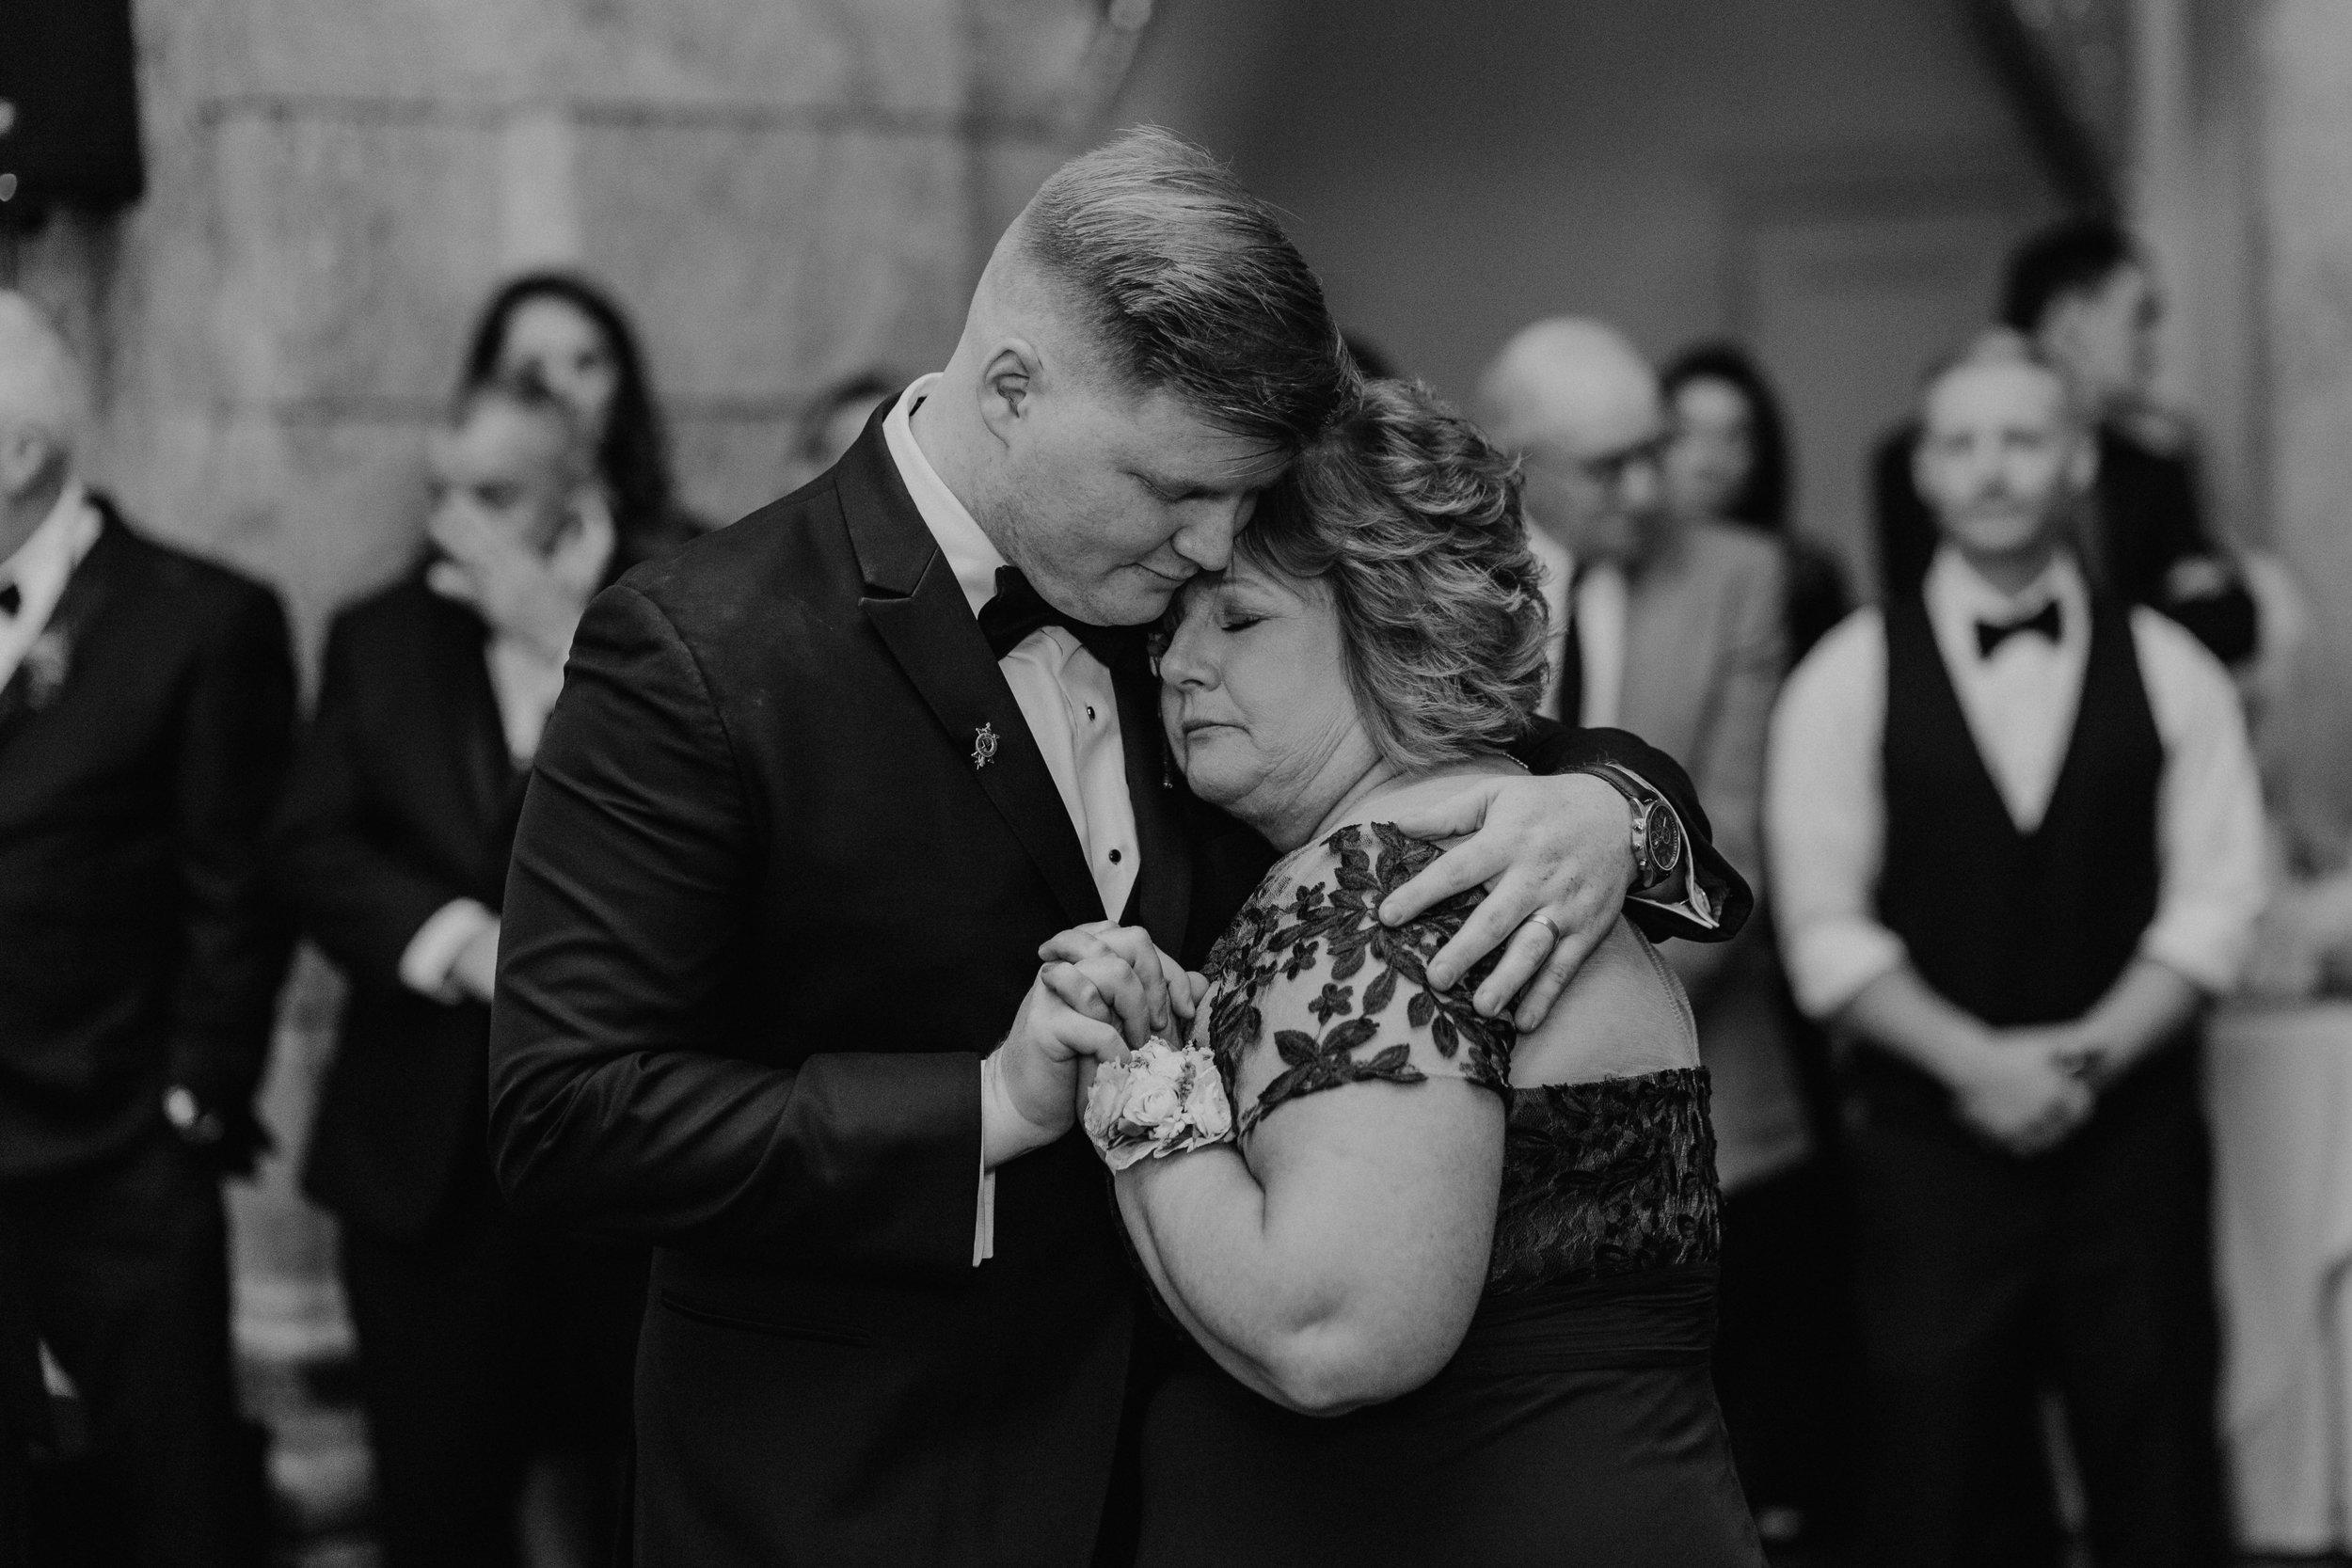 albany-new-york-wedding-50.jpg